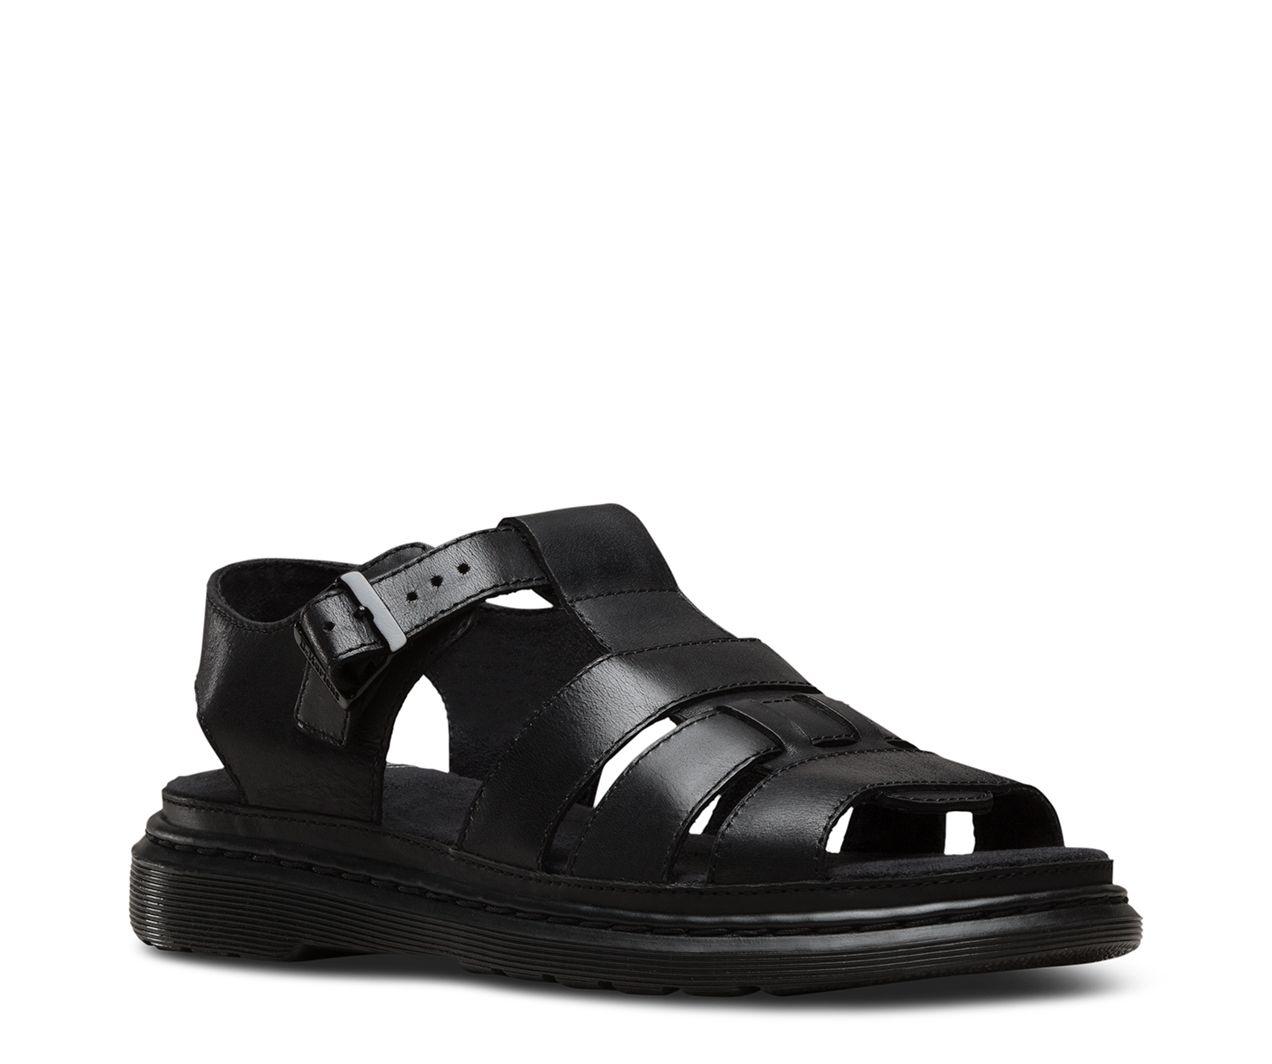 Carolyn ii new oily illusion | Sandals, Black sandals, Dr